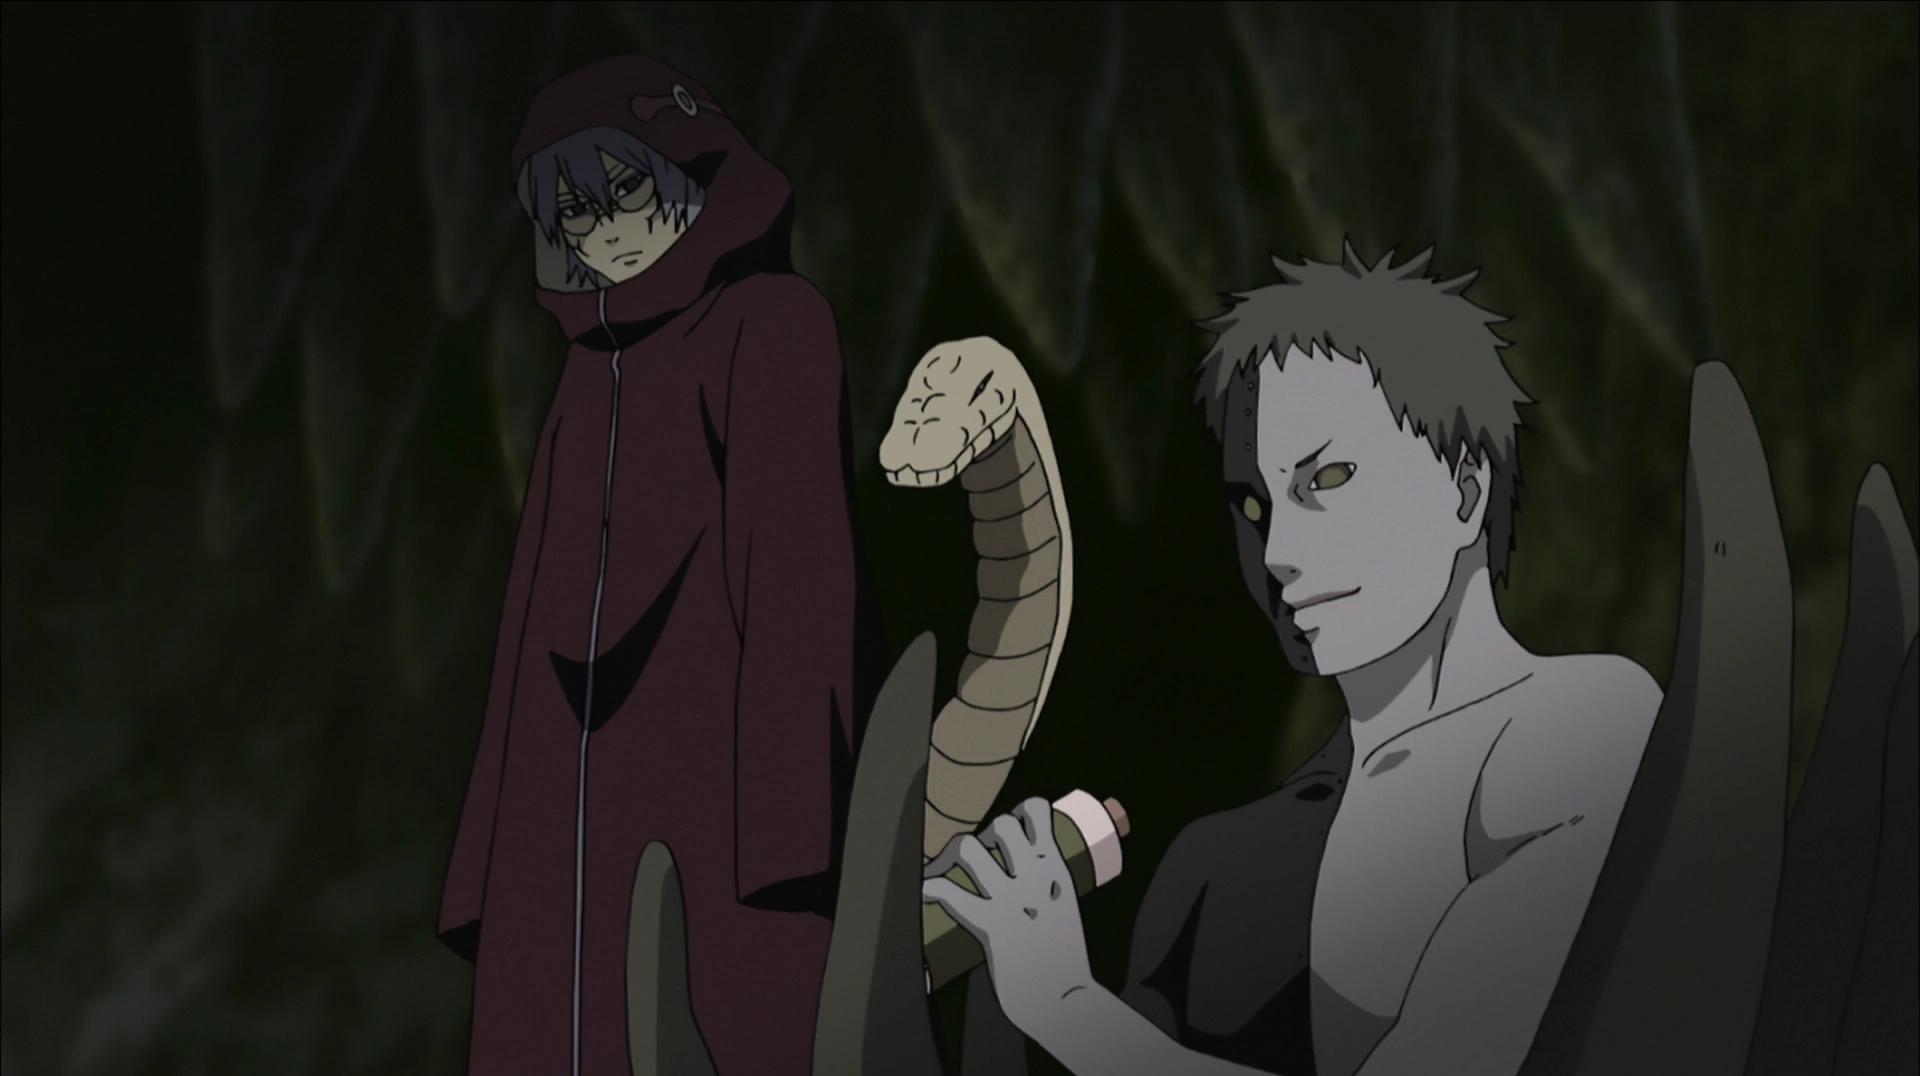 Naruto History And Descriptions: Zetsu